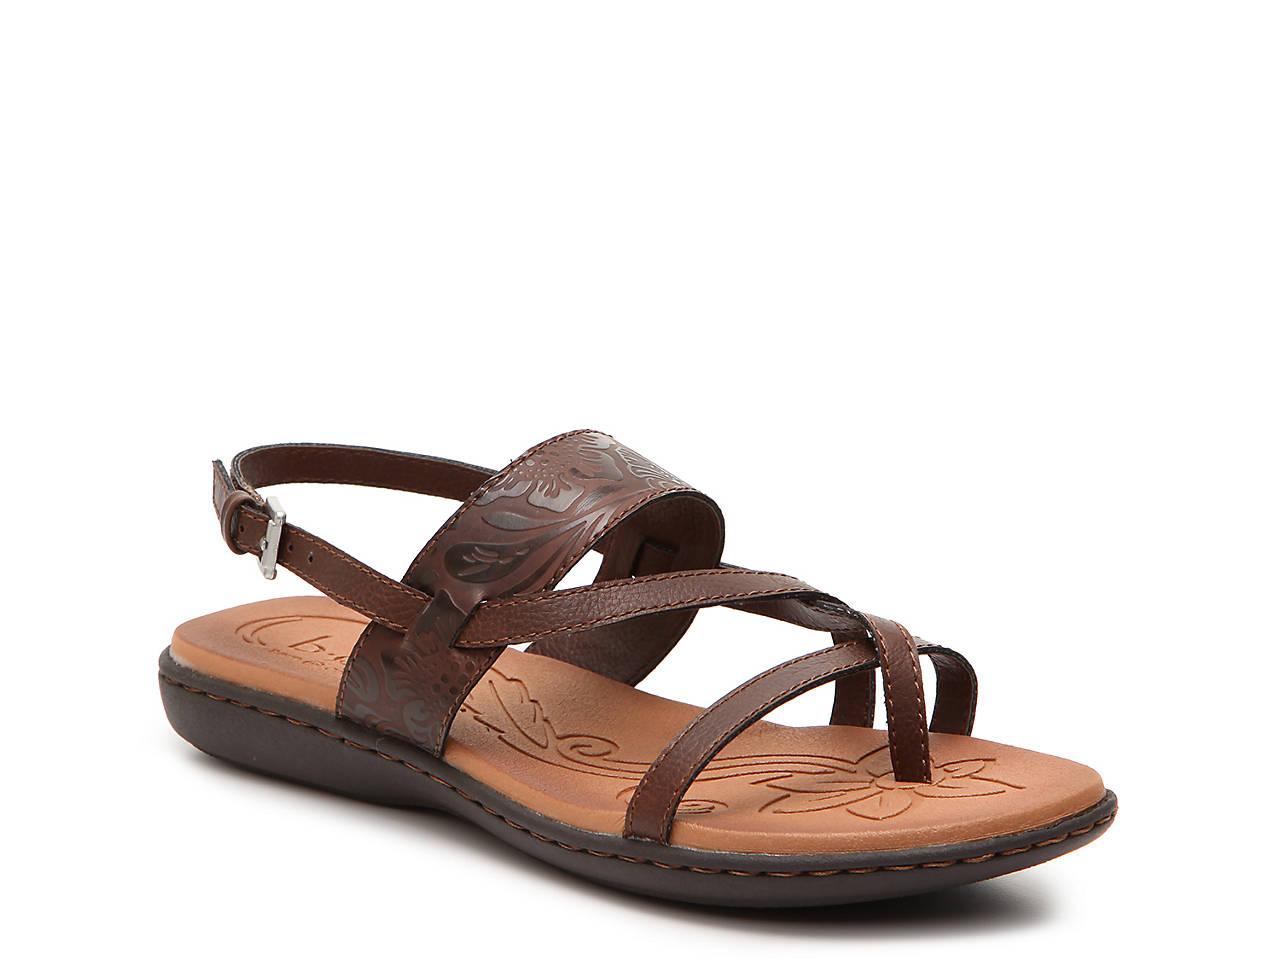 Dsw Flat Shoes